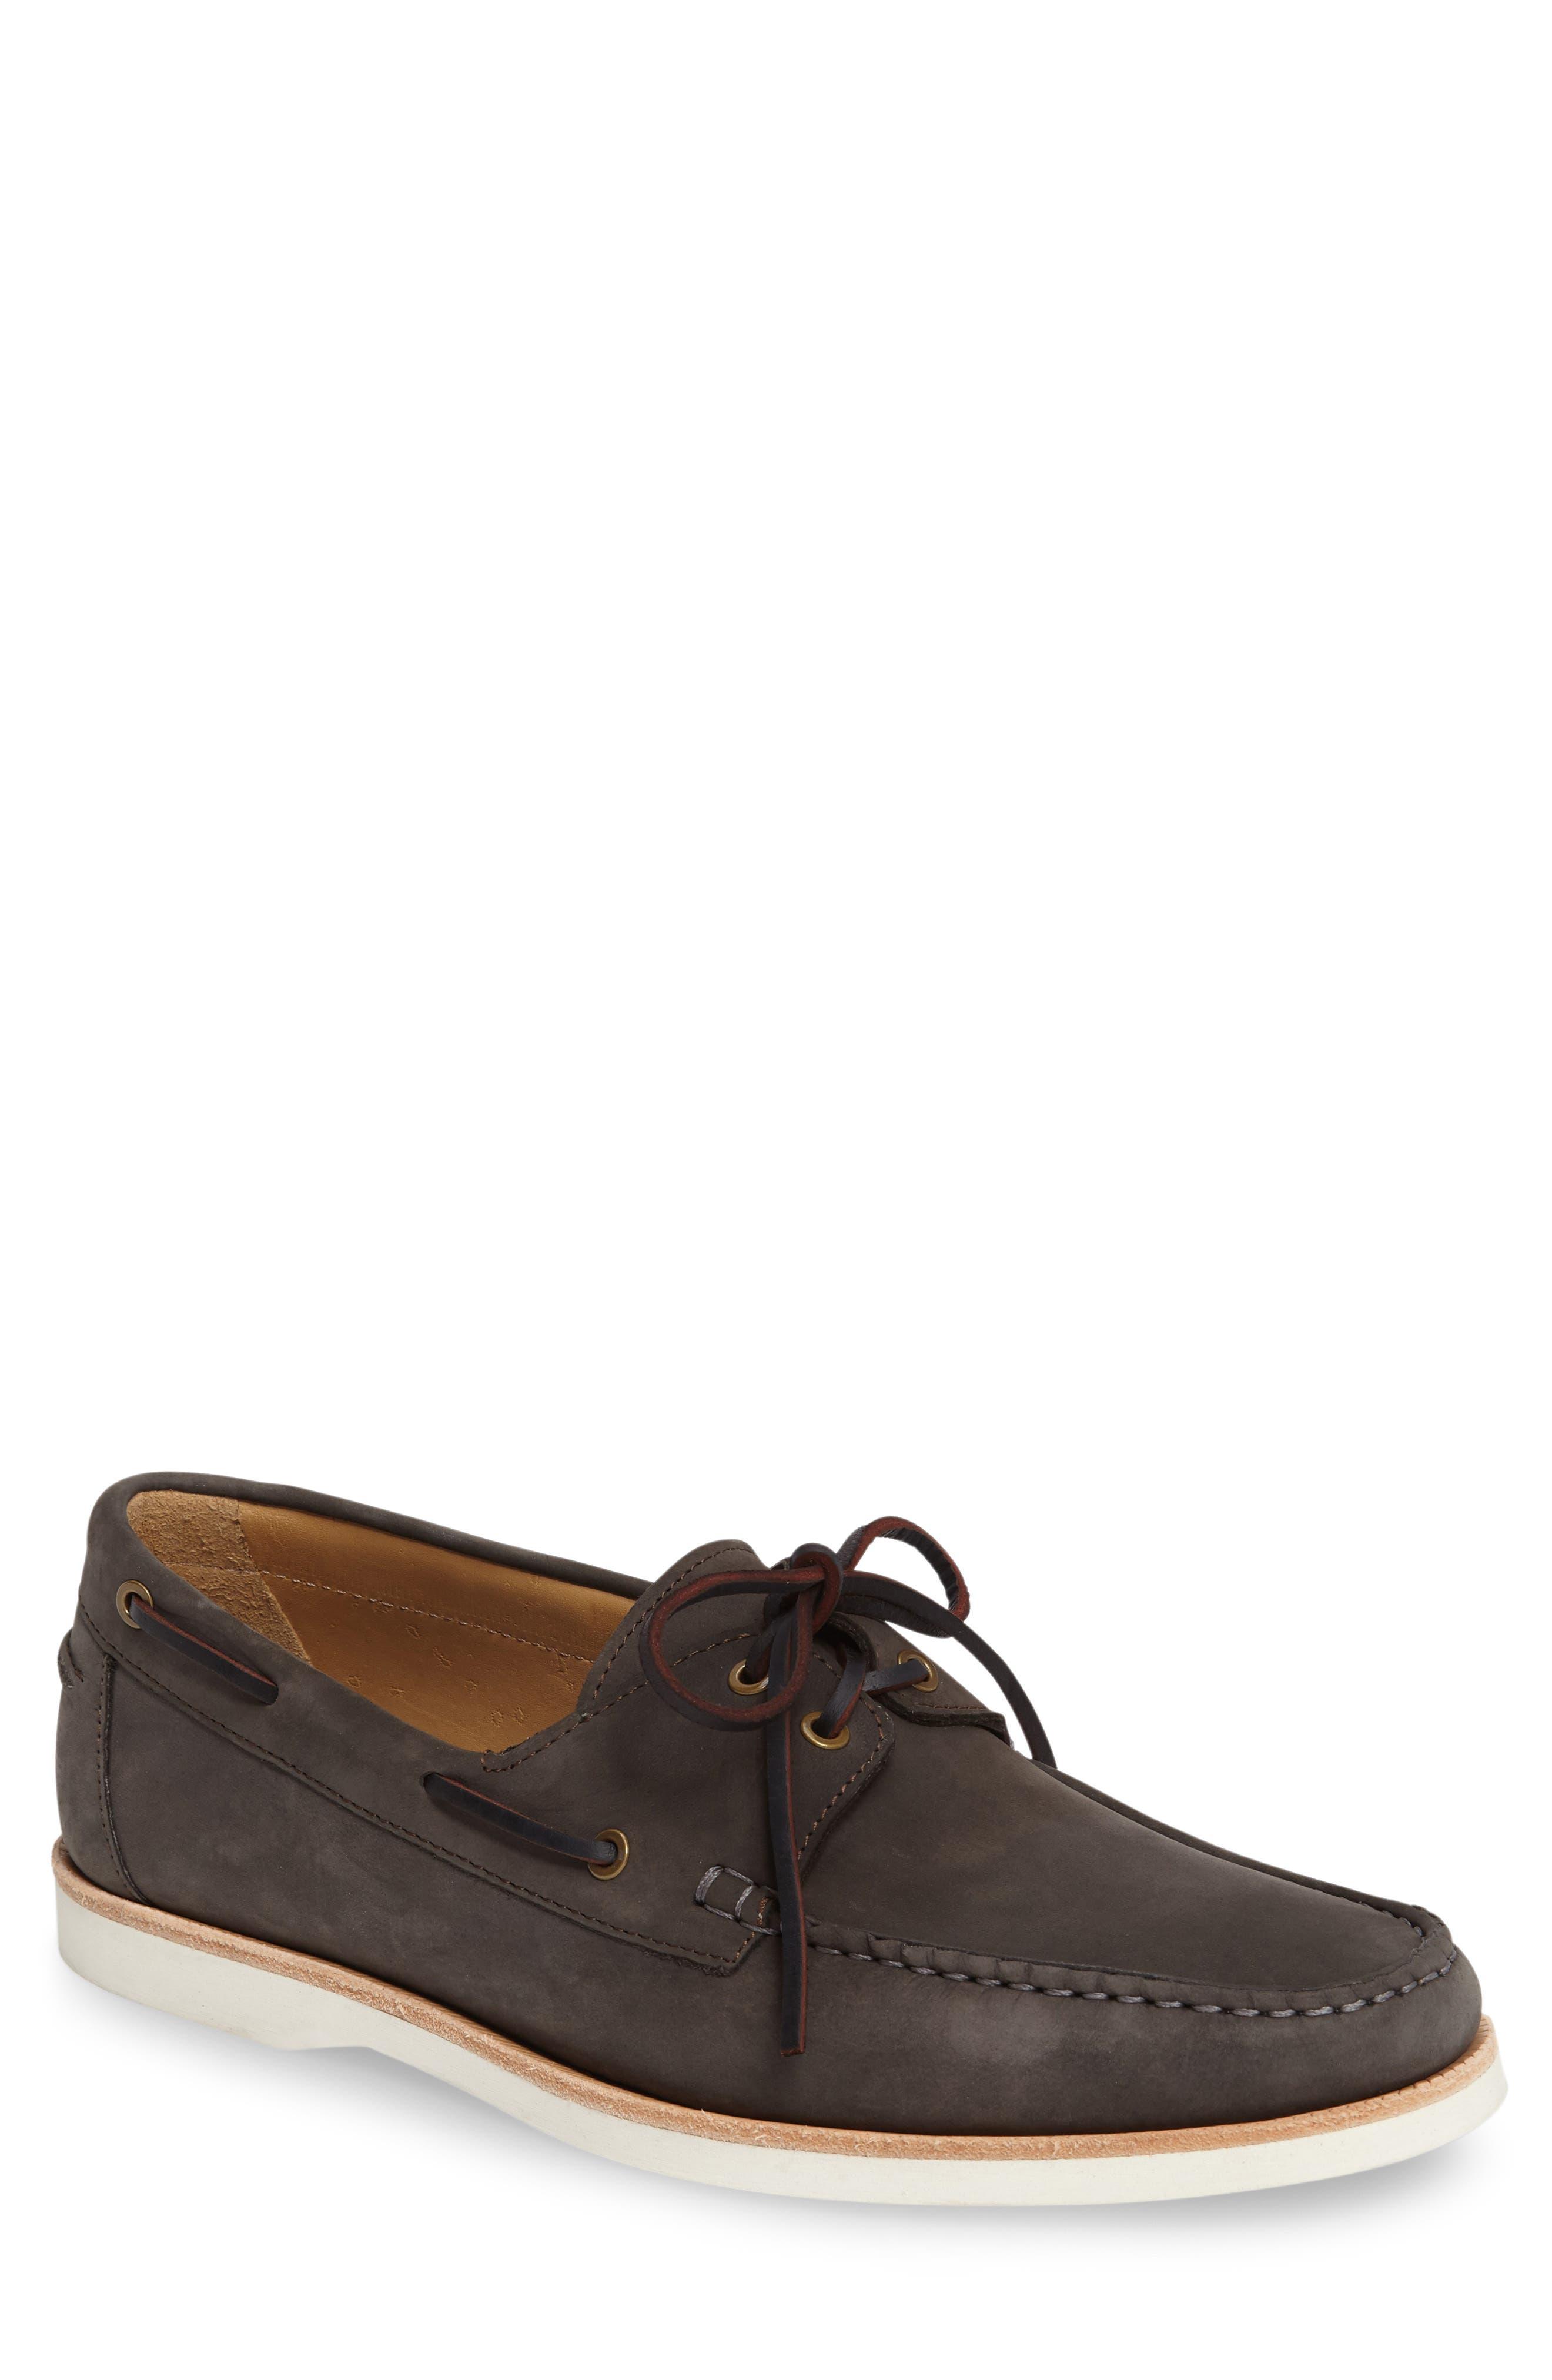 Cooper Boat Shoe,                         Main,                         color, SLATE NUBUCK LEATHER